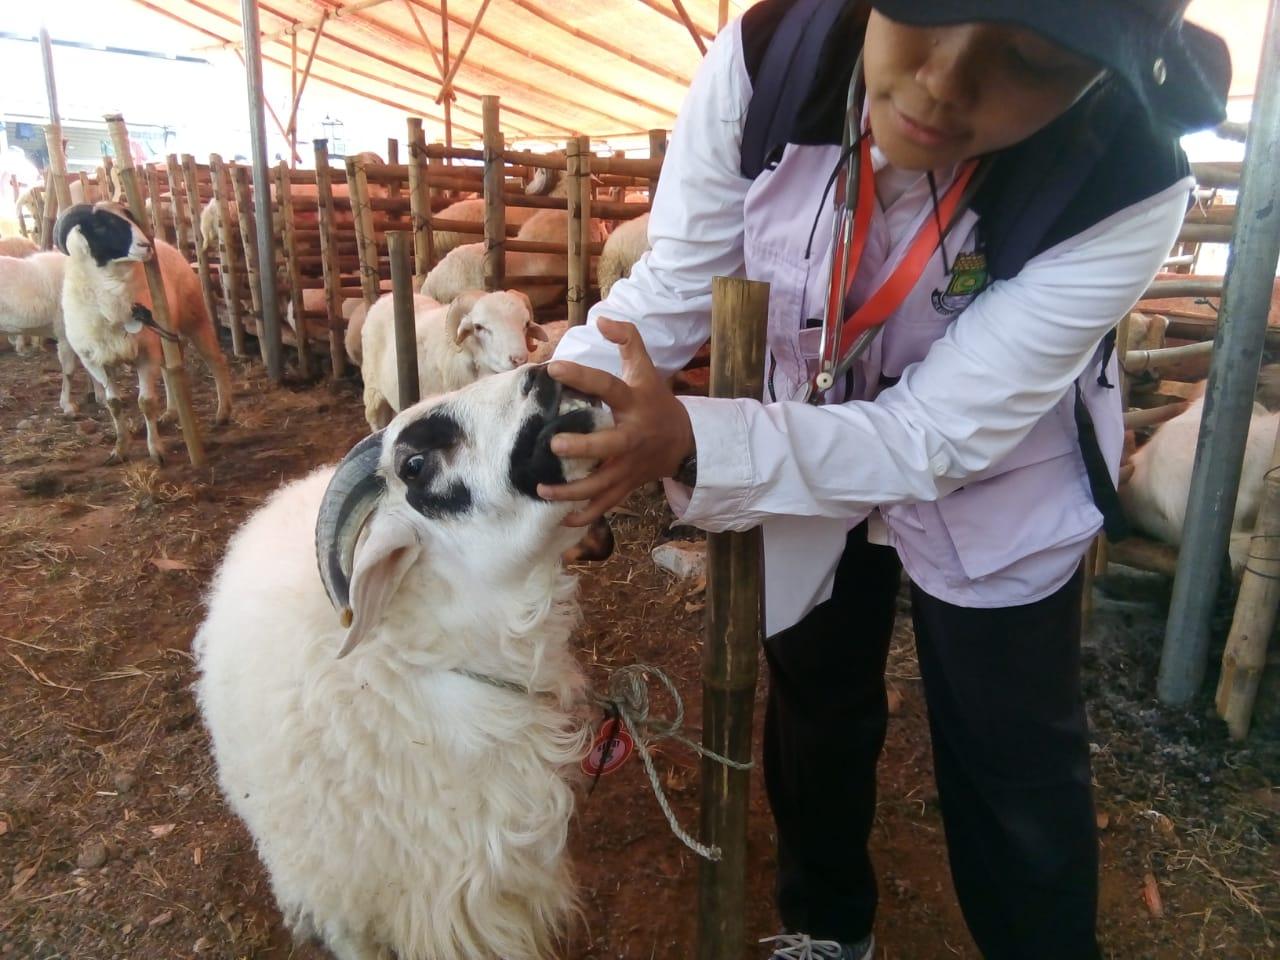 Pemkab Tangerang Imbau Warga Beli Hewan Kurban Berlabel